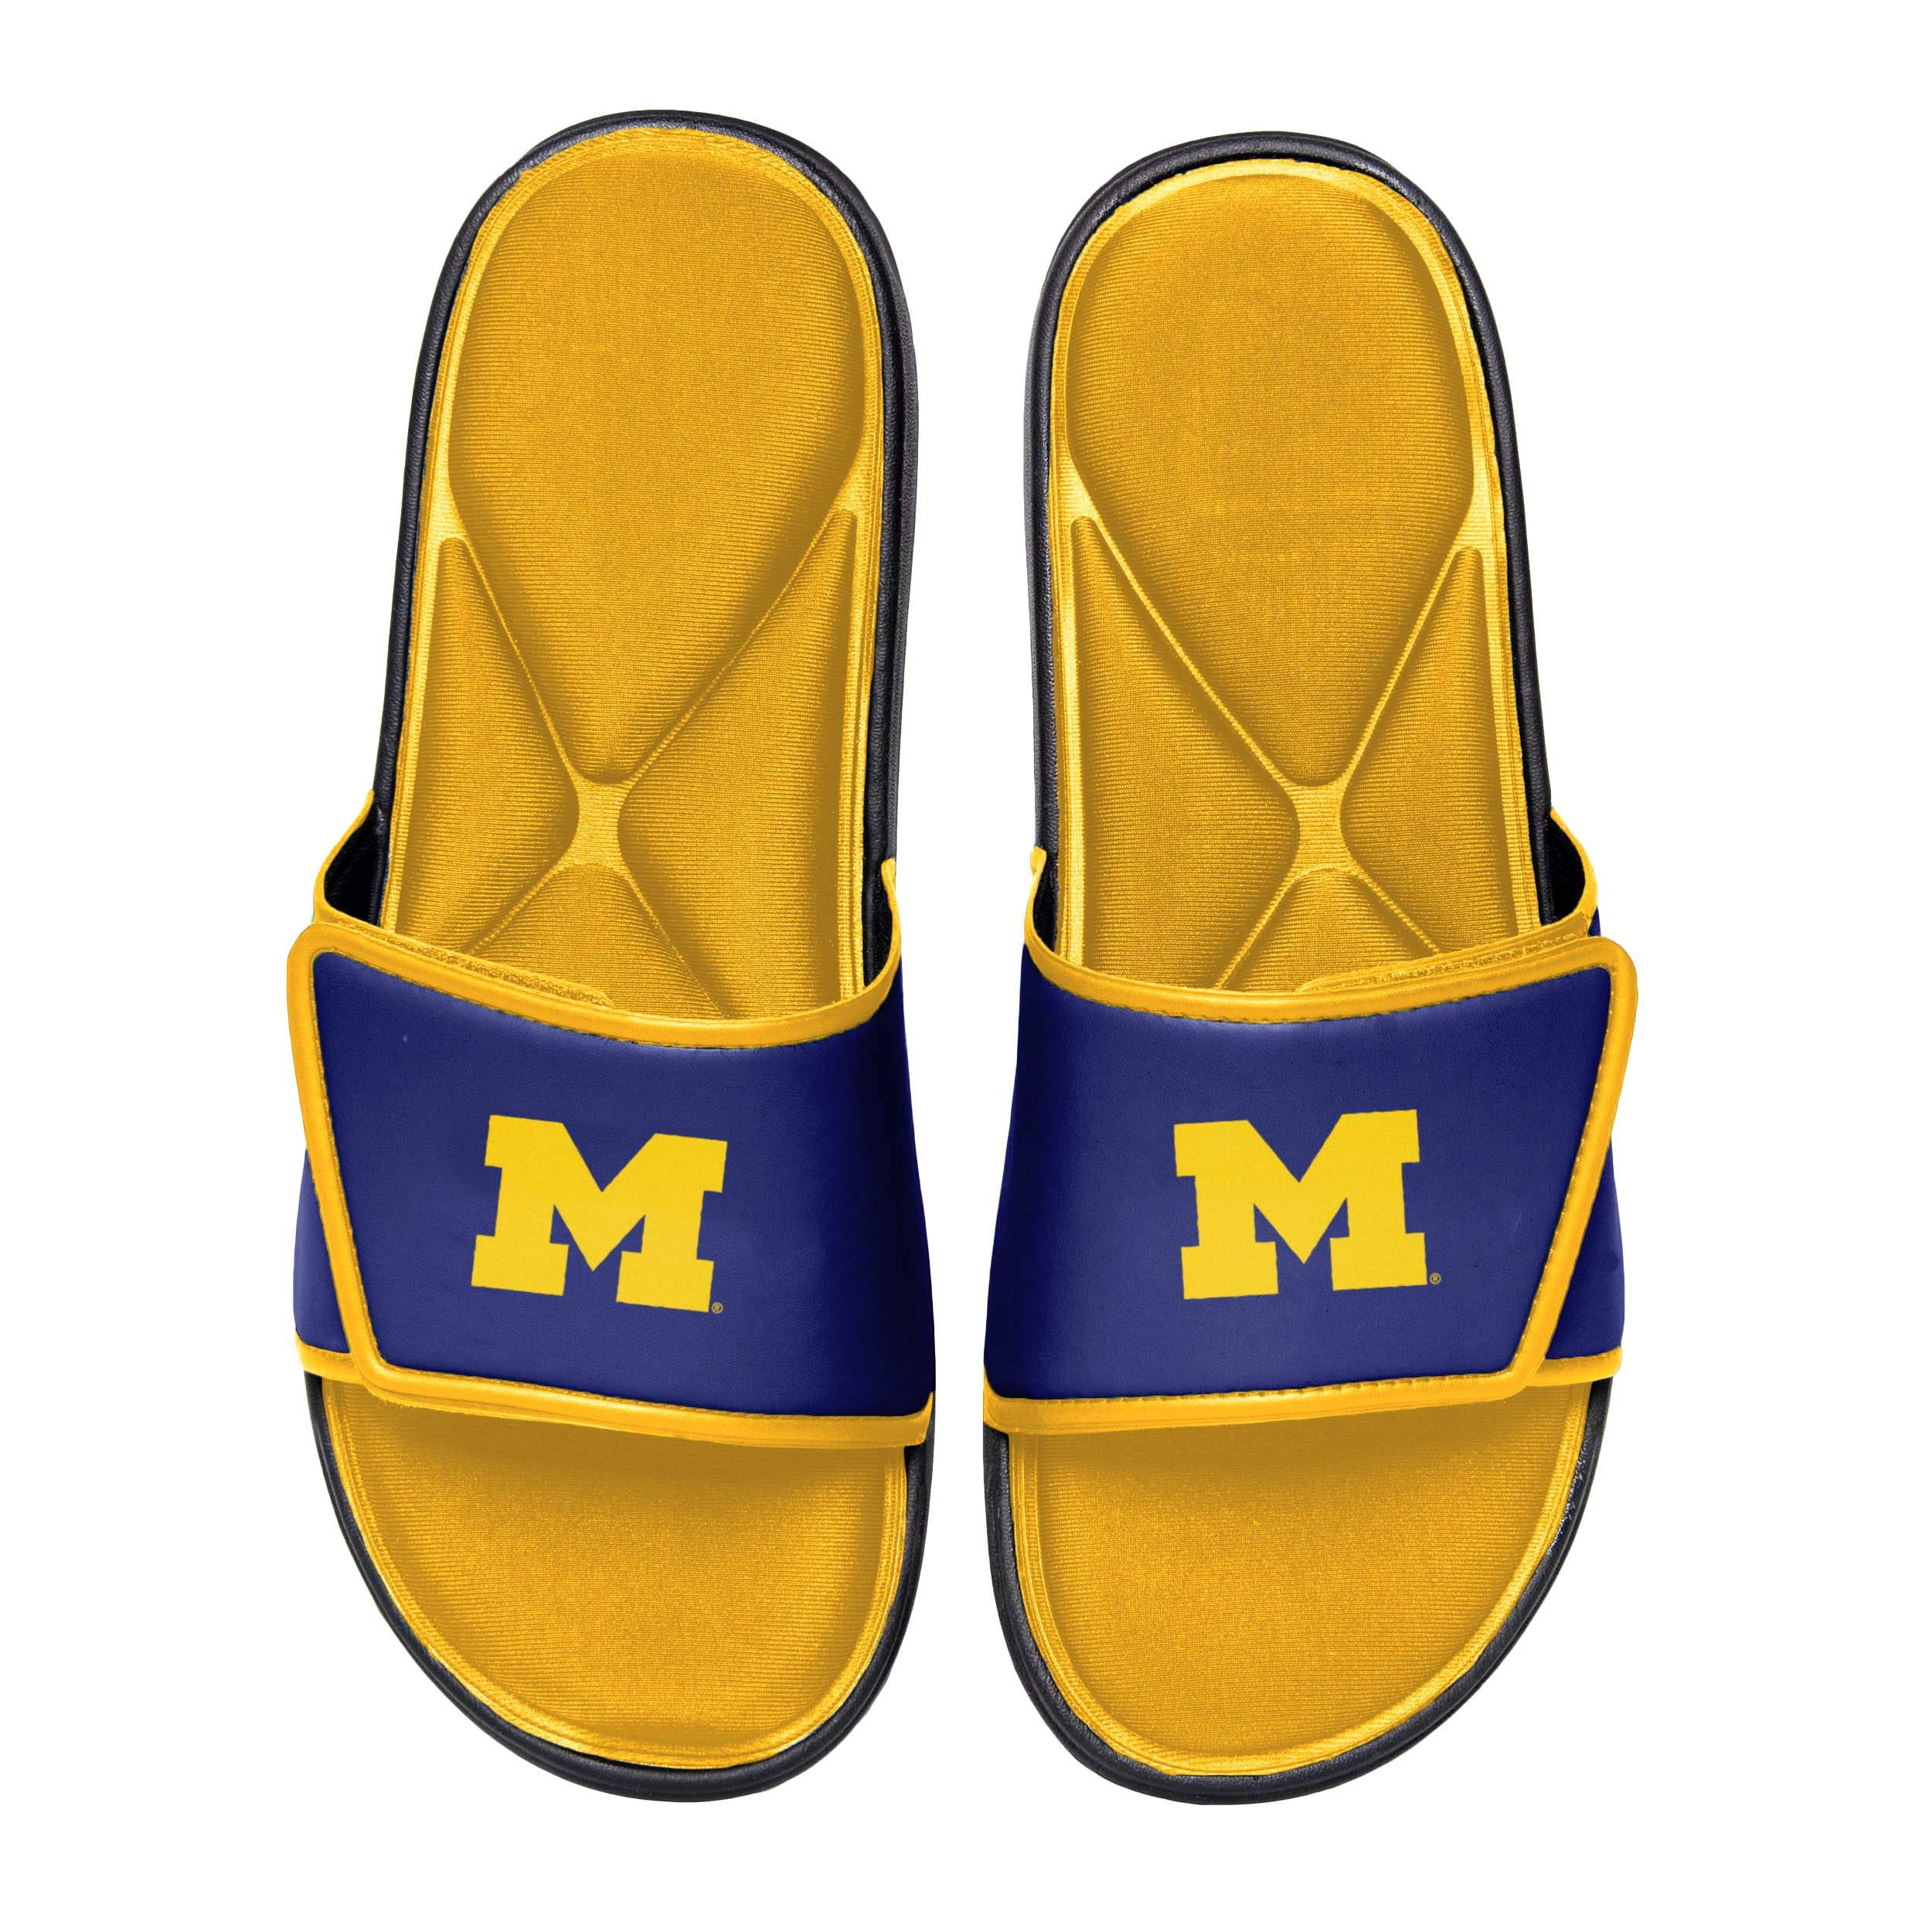 NCAA Michigan Wolverines Mens Deluxe Foam Sport Shower Slide Flip Flop SandalsDeluxe Foam Sport Shower Slide Flip Flop Sandals, Team Color, Medium/Mens Size 9-10